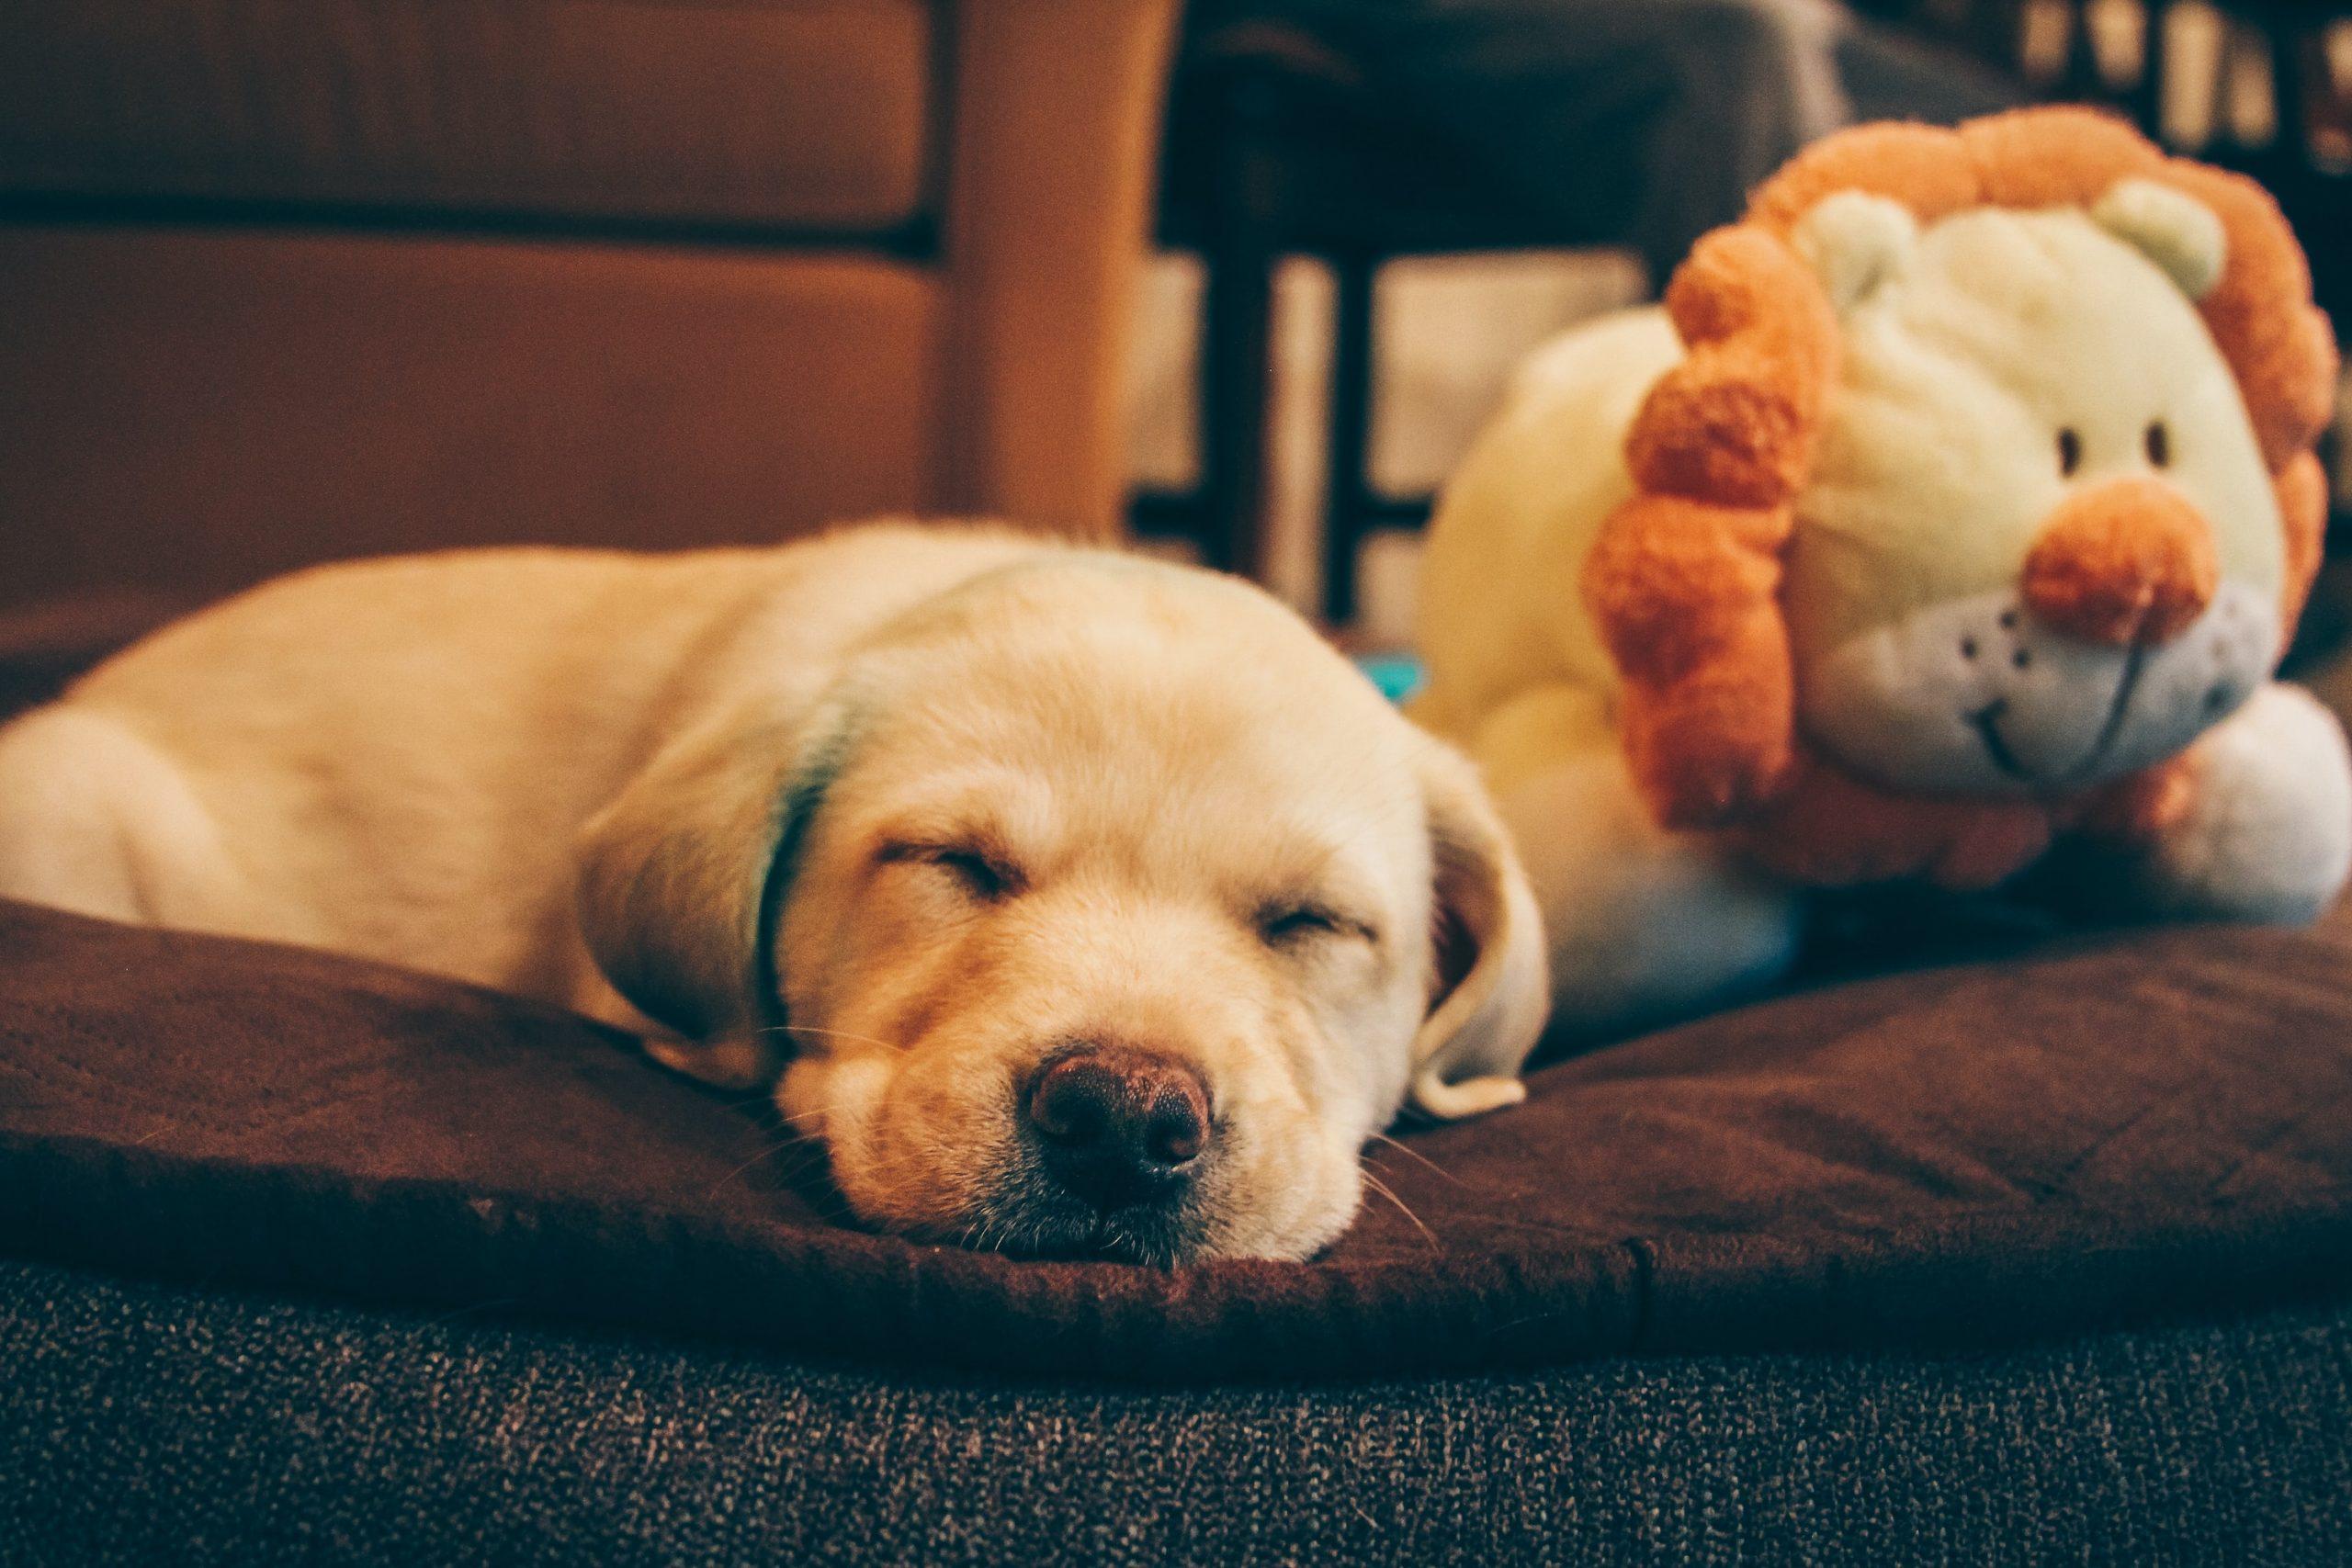 Cachorros de labrador 3 by Kshitij Shah